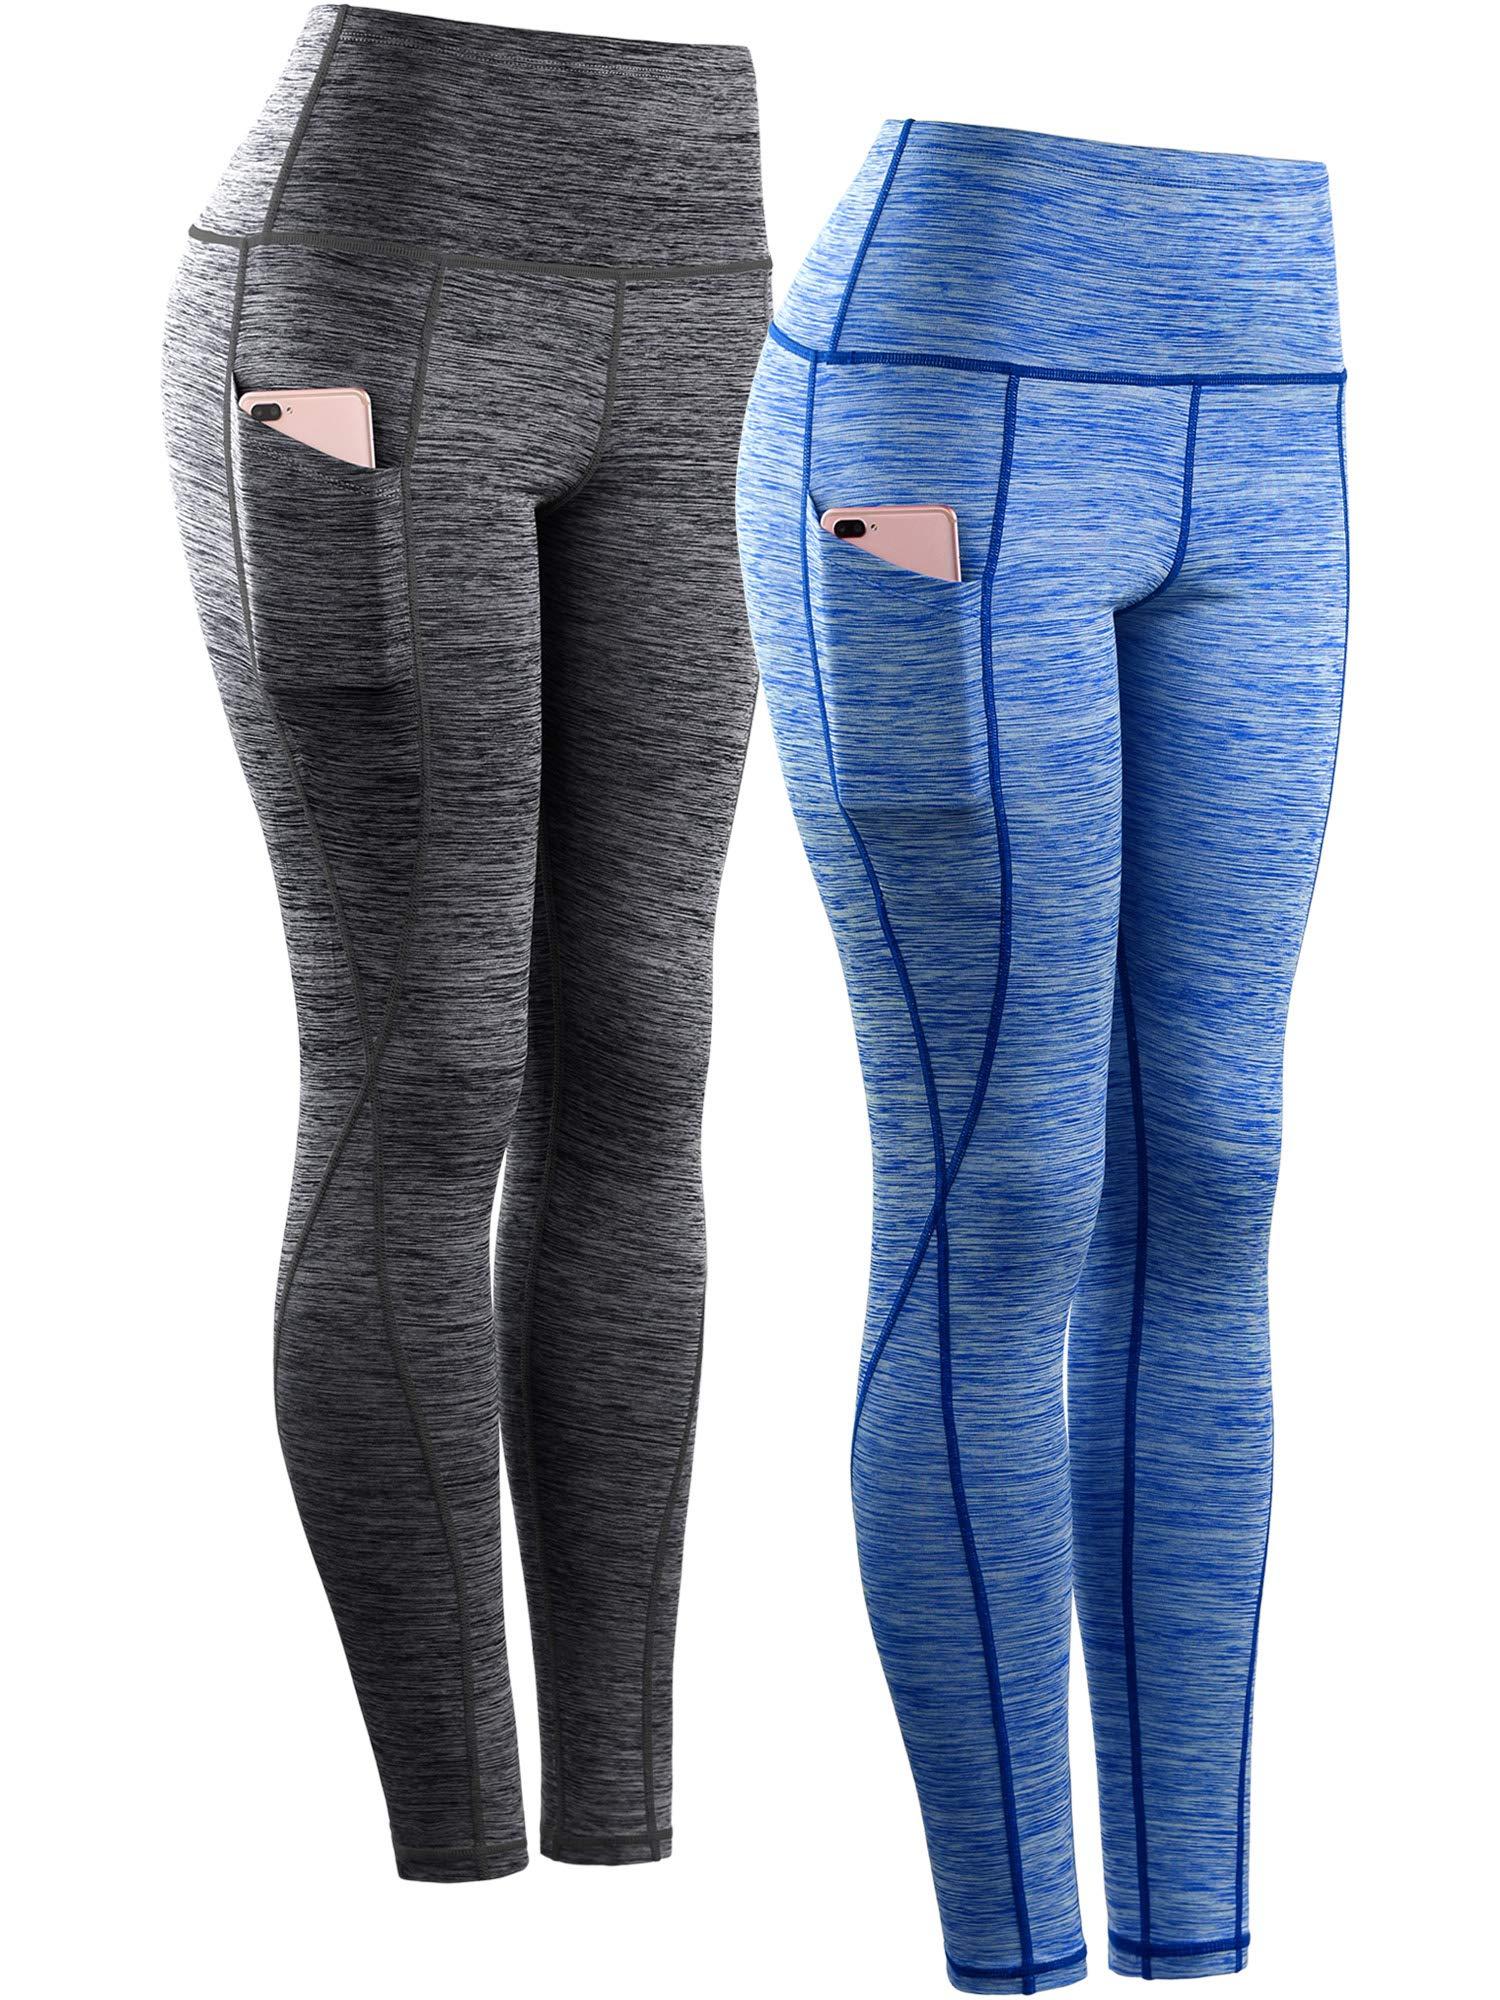 Neleus Tummy Control High Waist Workout Running Leggings for Women,9033,Yoga Pant 2 Pack,Black,Blue,S,EU M